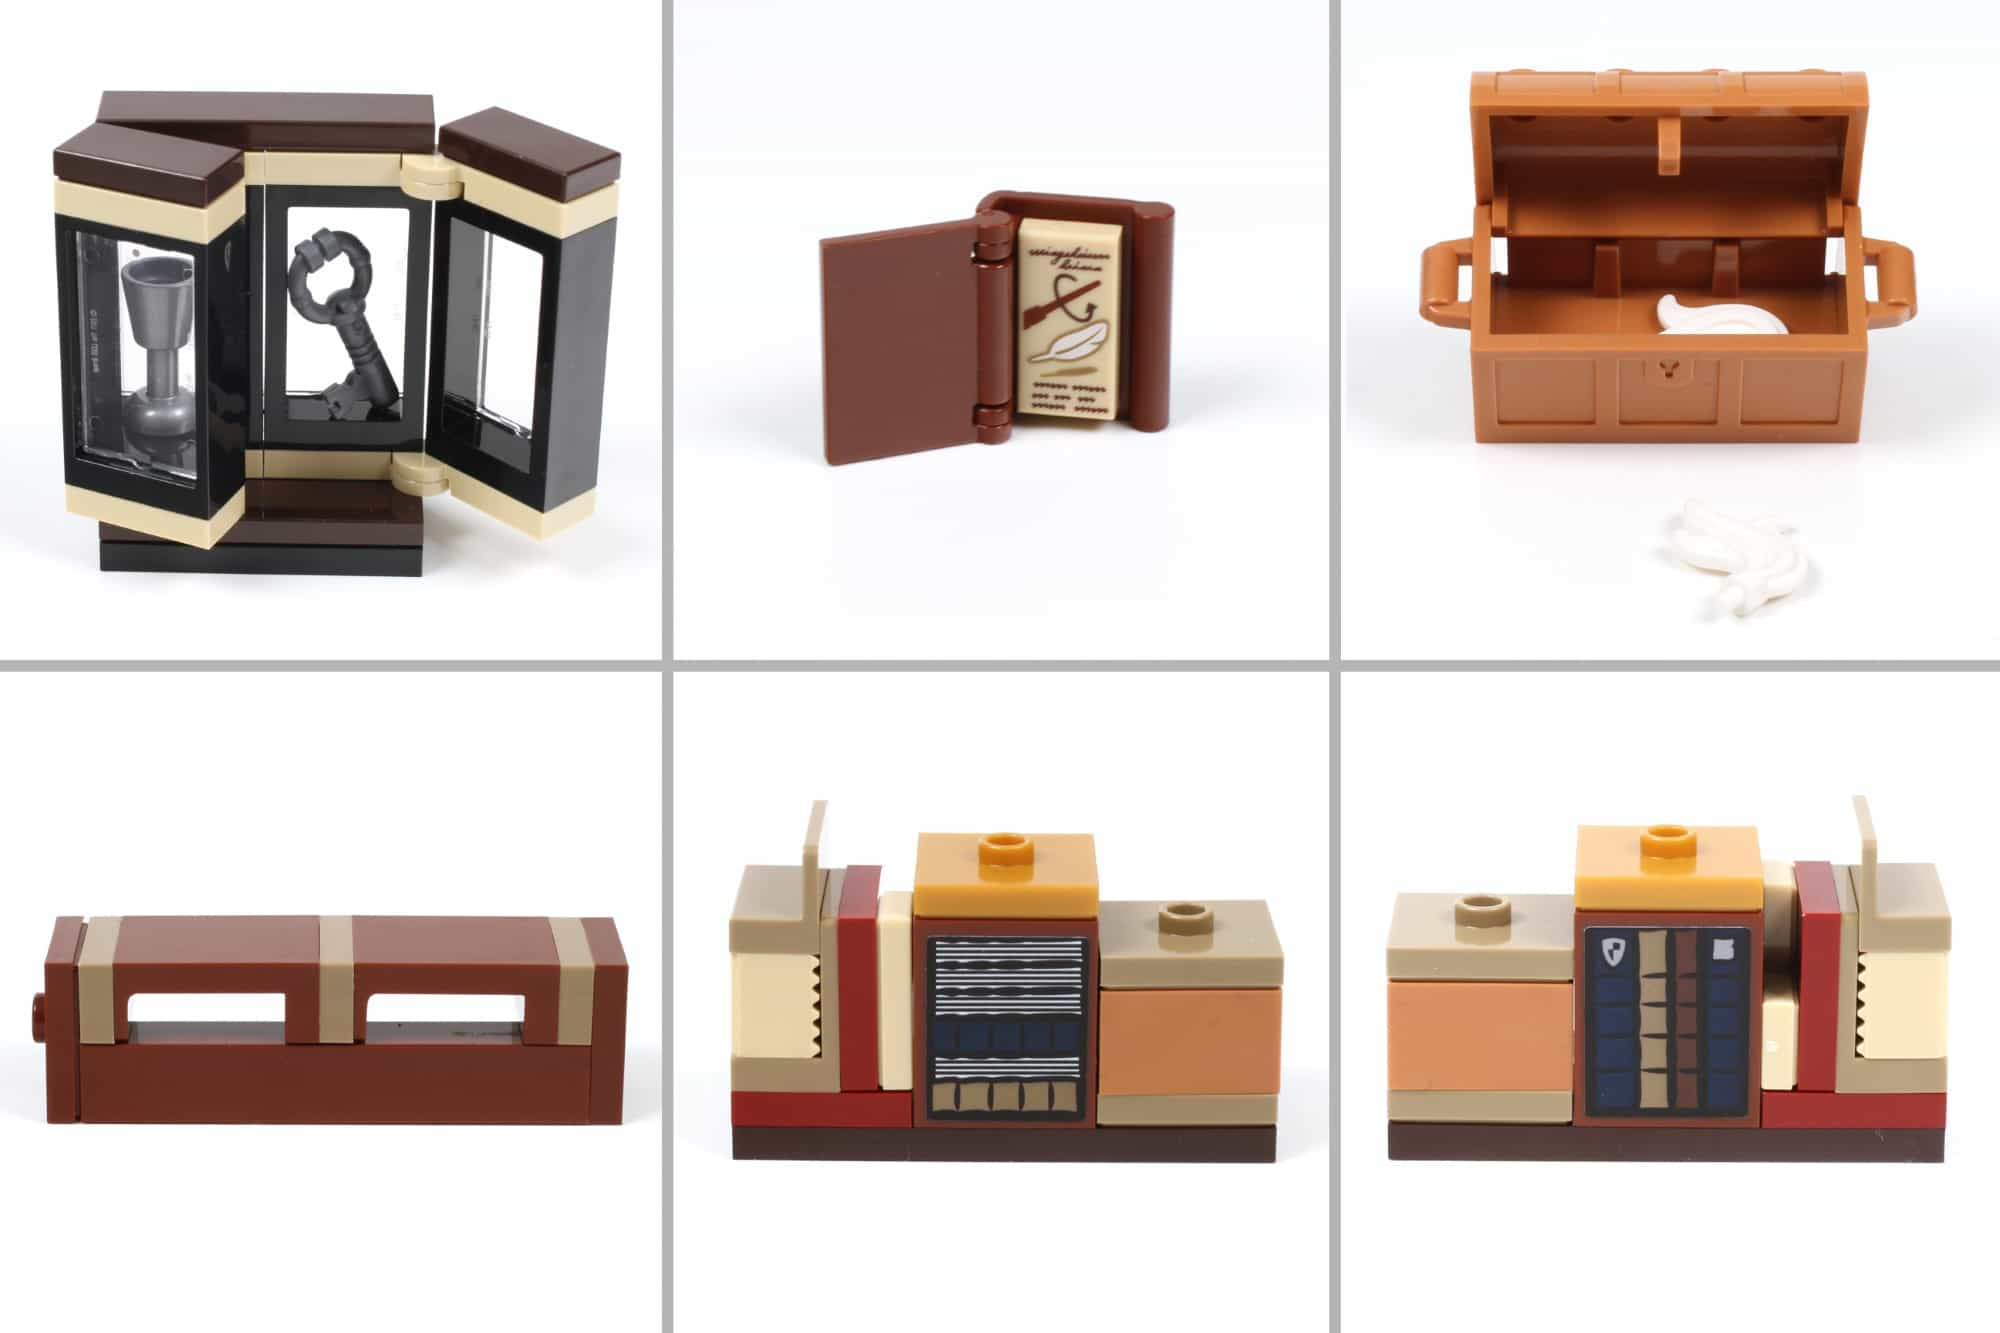 LEGO Harry Potter 76385 Hogwarts Moment Zauberkunstunterricht Minibuilds Schritt 1